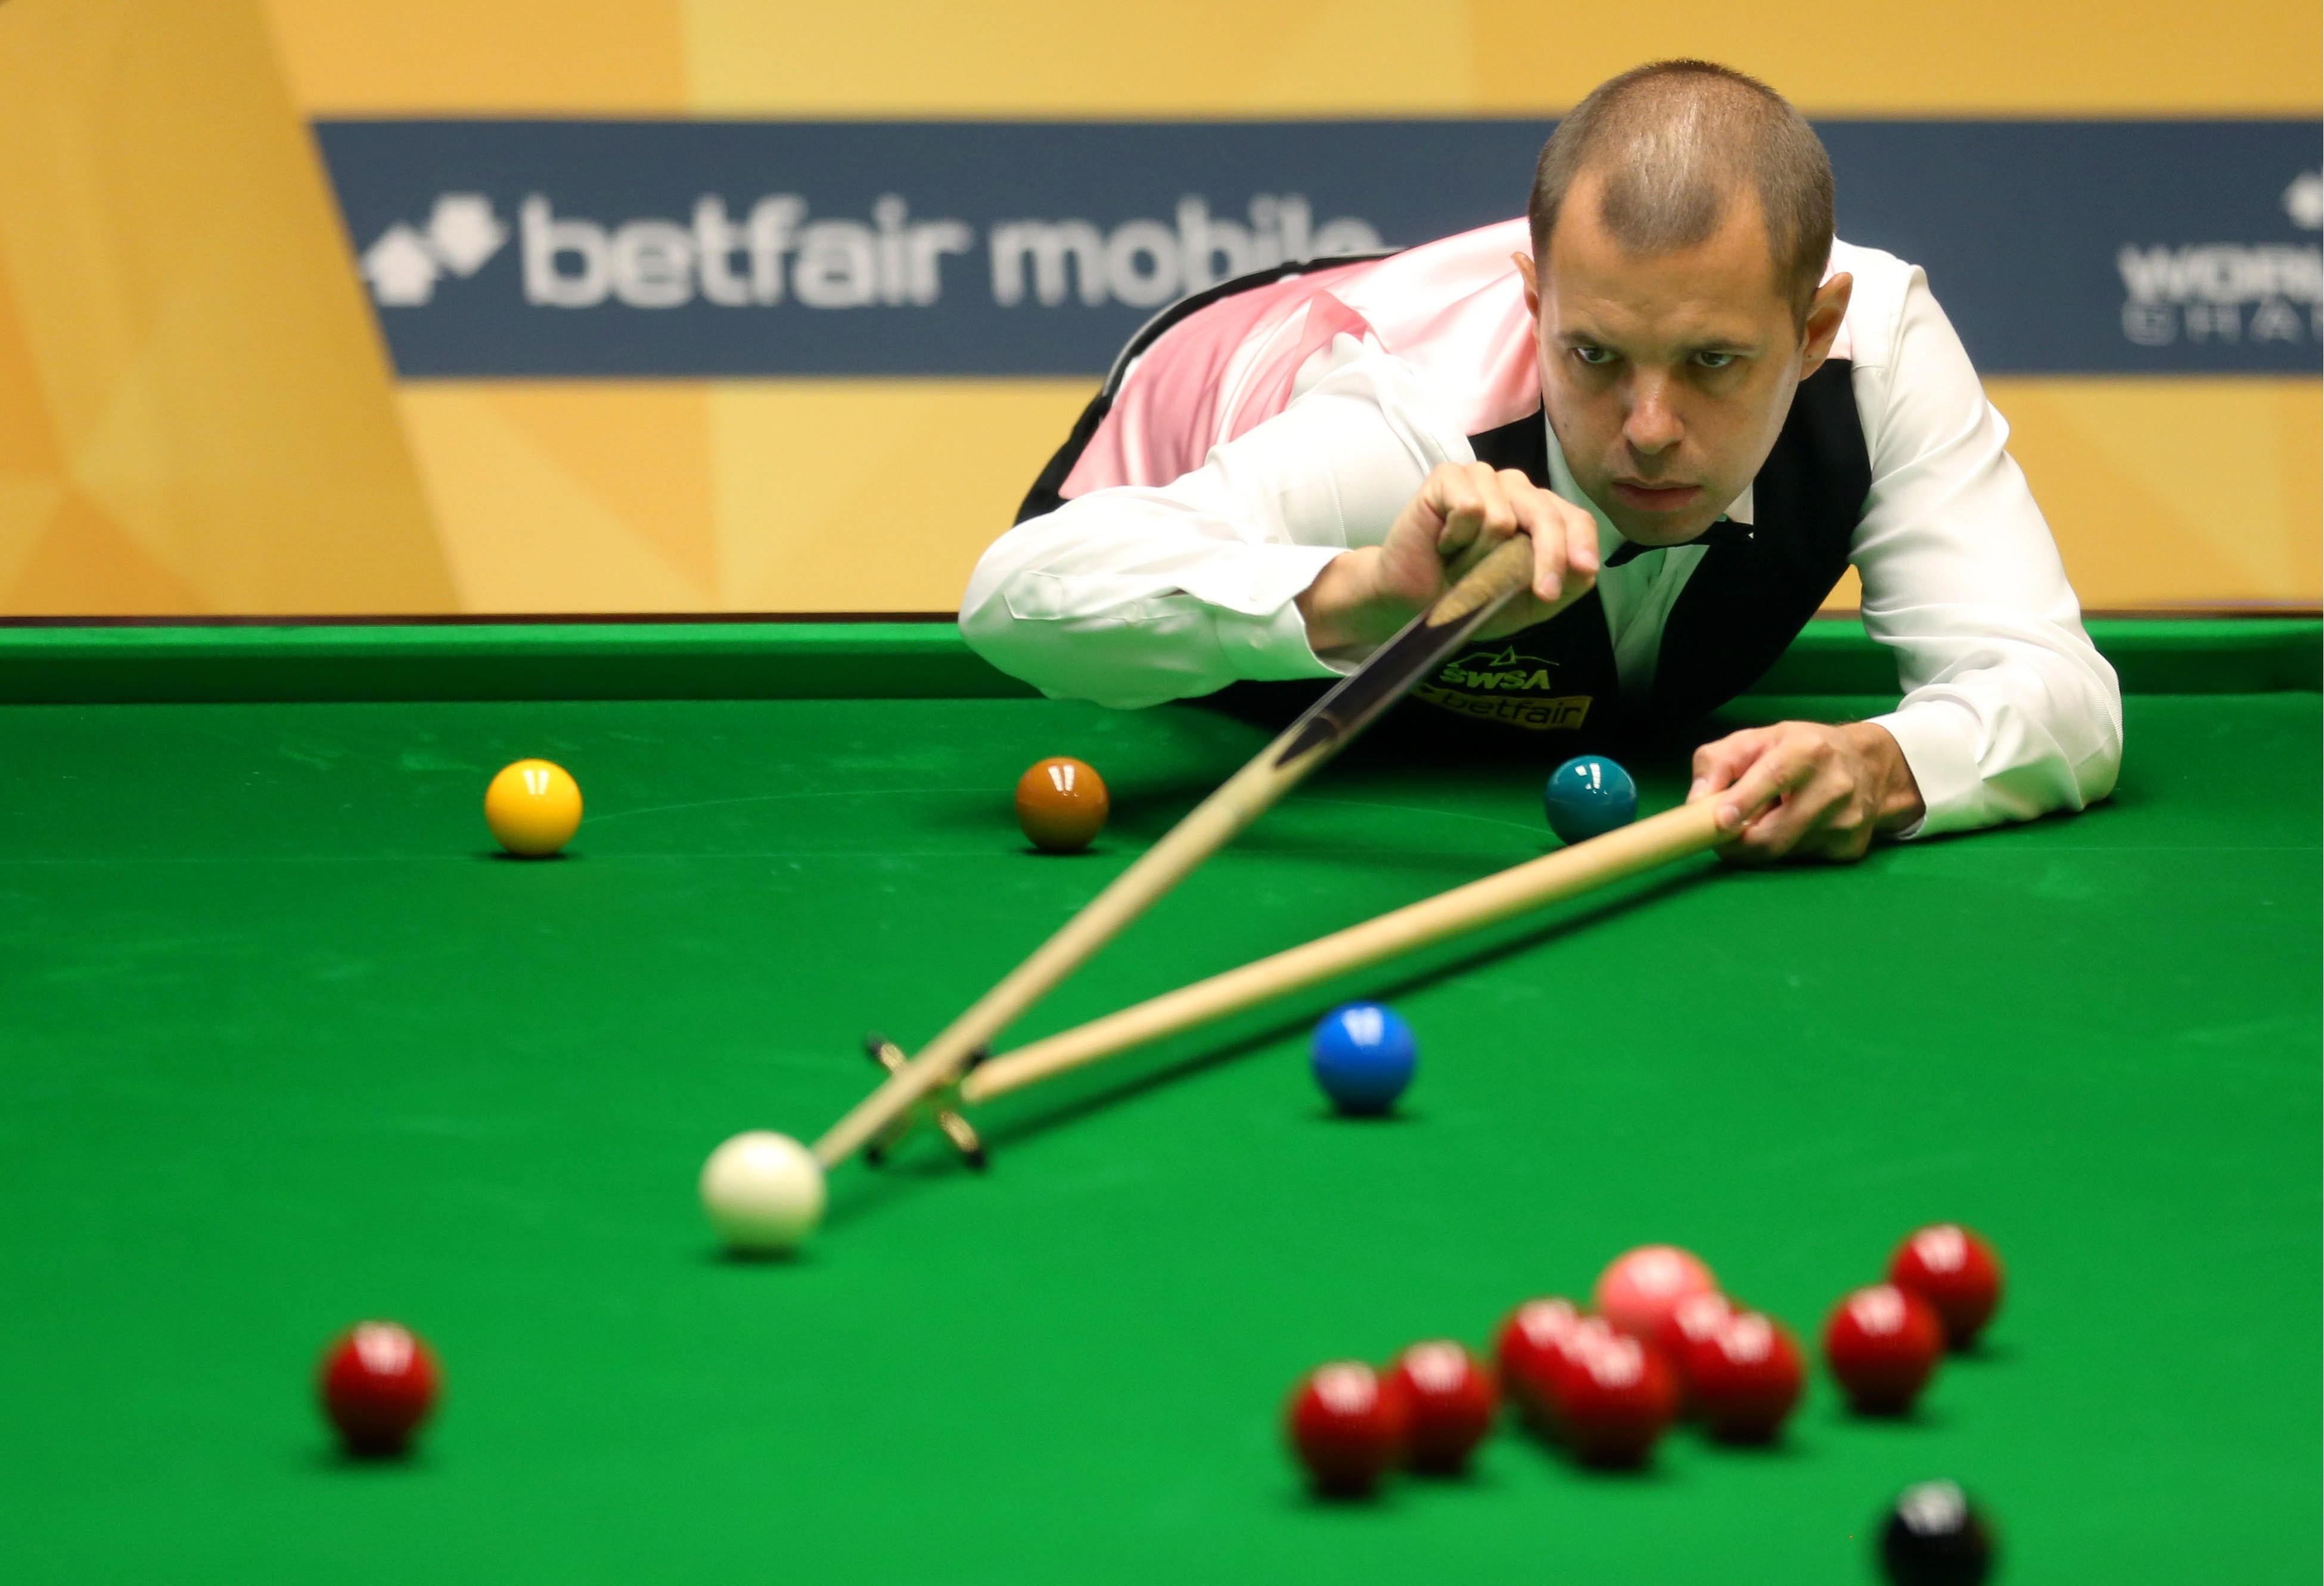 Betfair World Snooker Championship